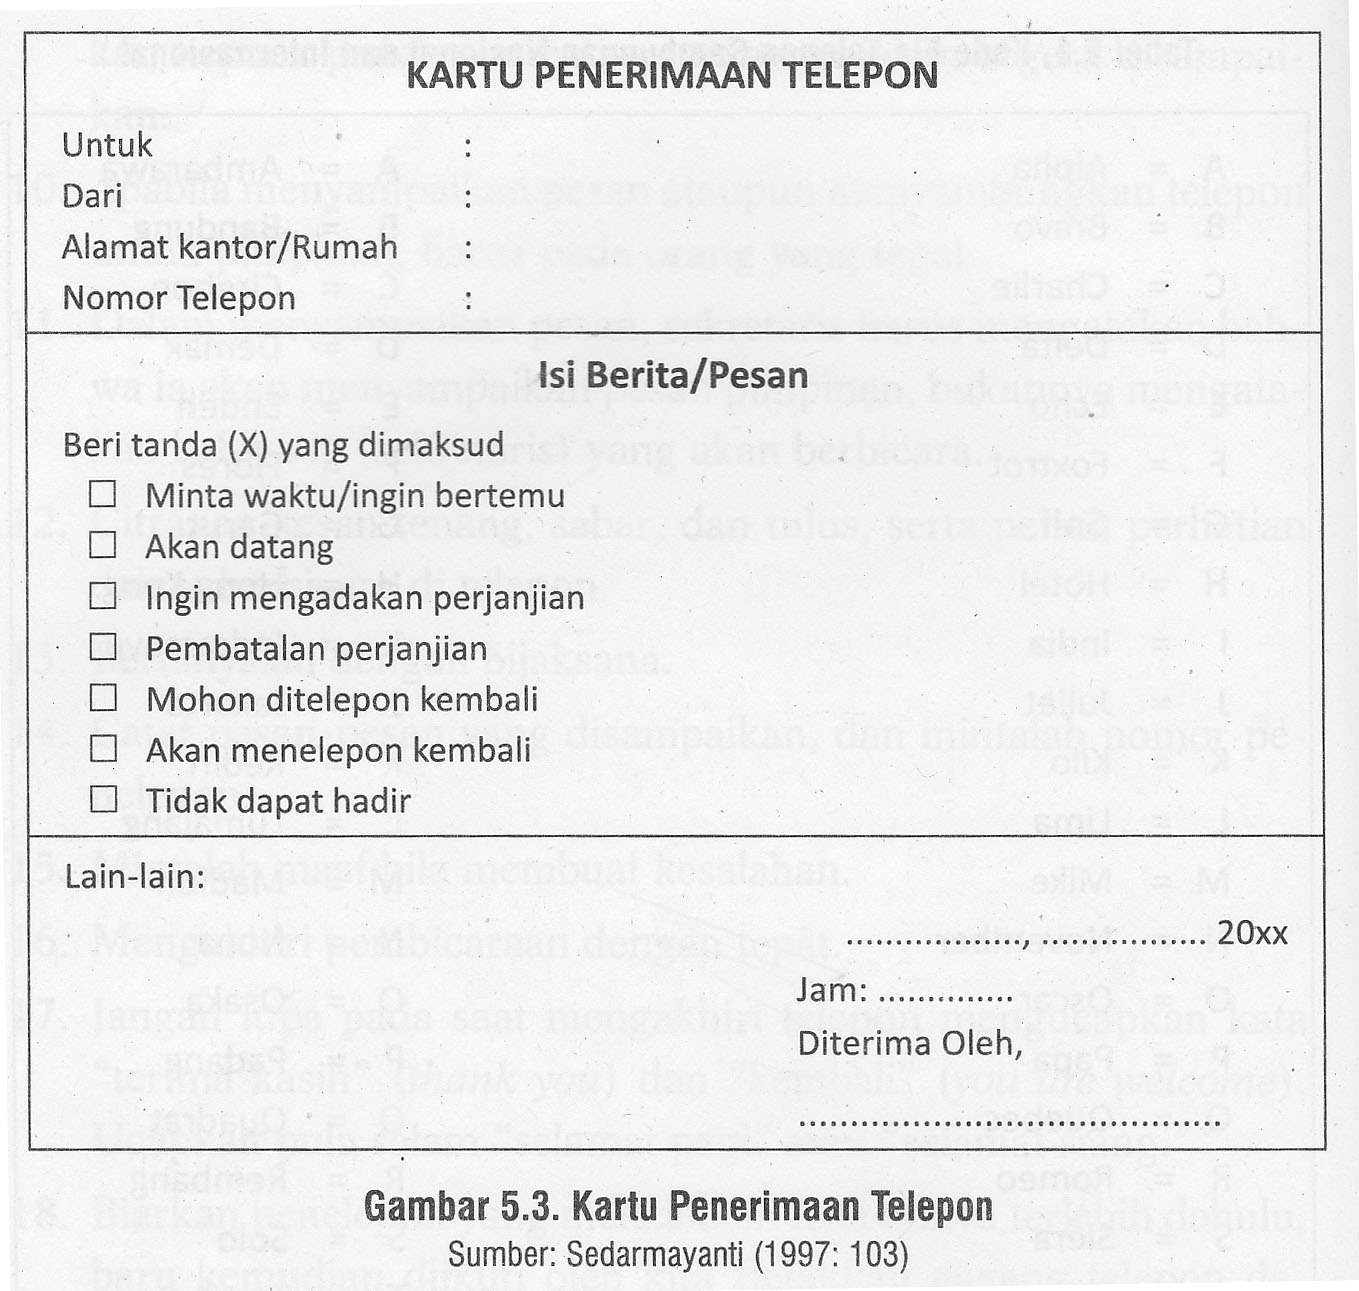 Tugas Kesekretarisan Skenario Penerimaan Telepon Dan Tamu Rohmatul